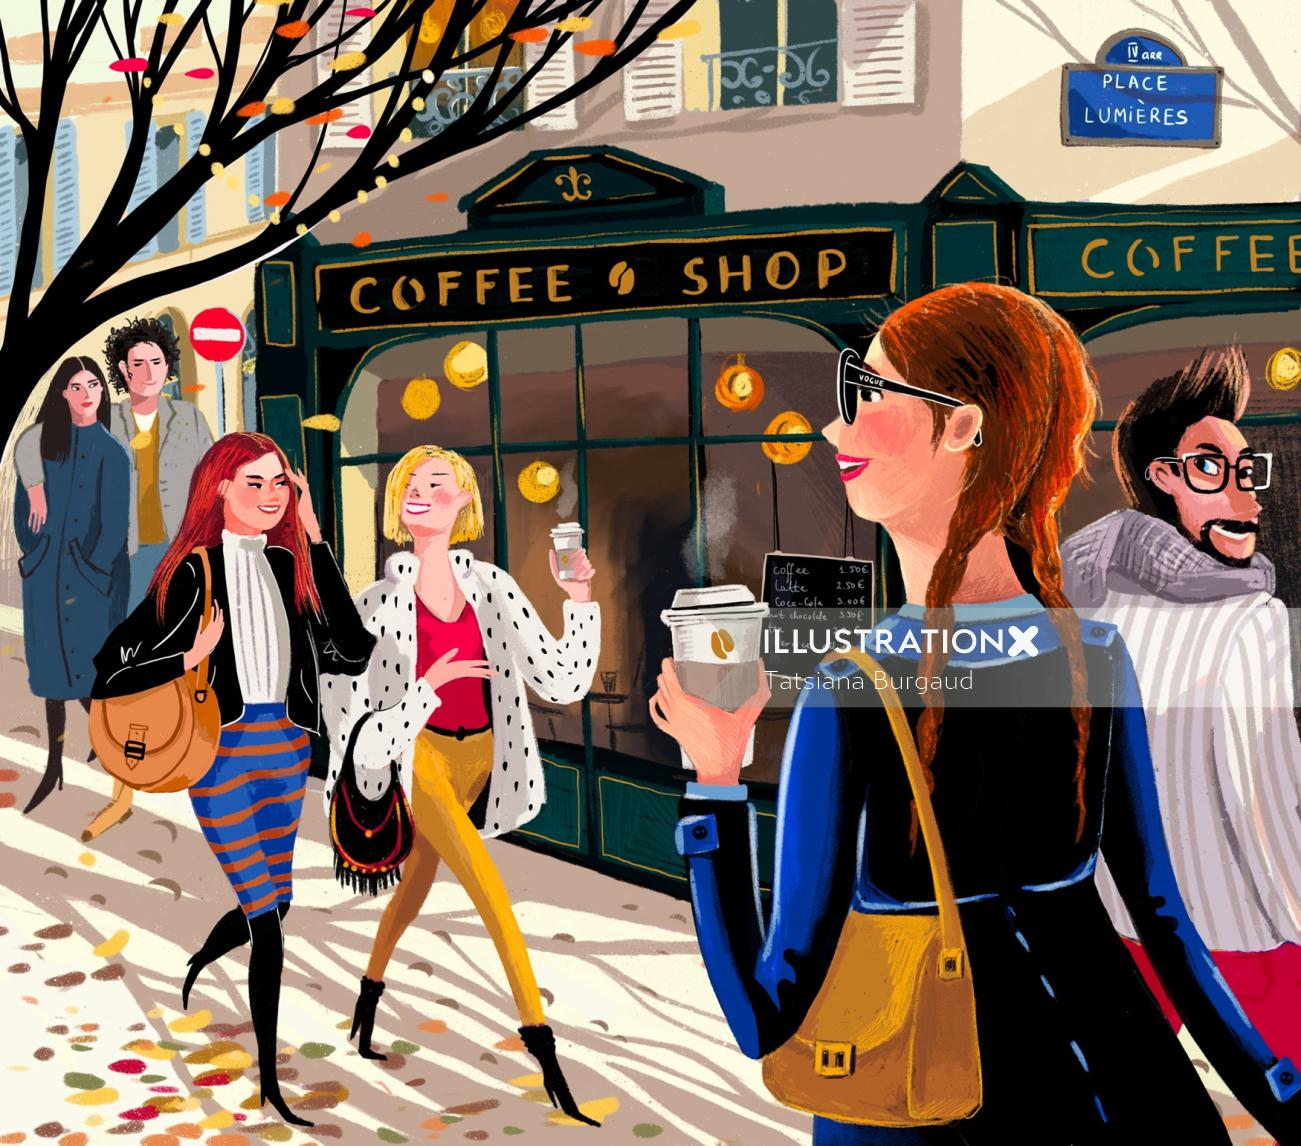 coffee, street, people, youth, couple, autumn